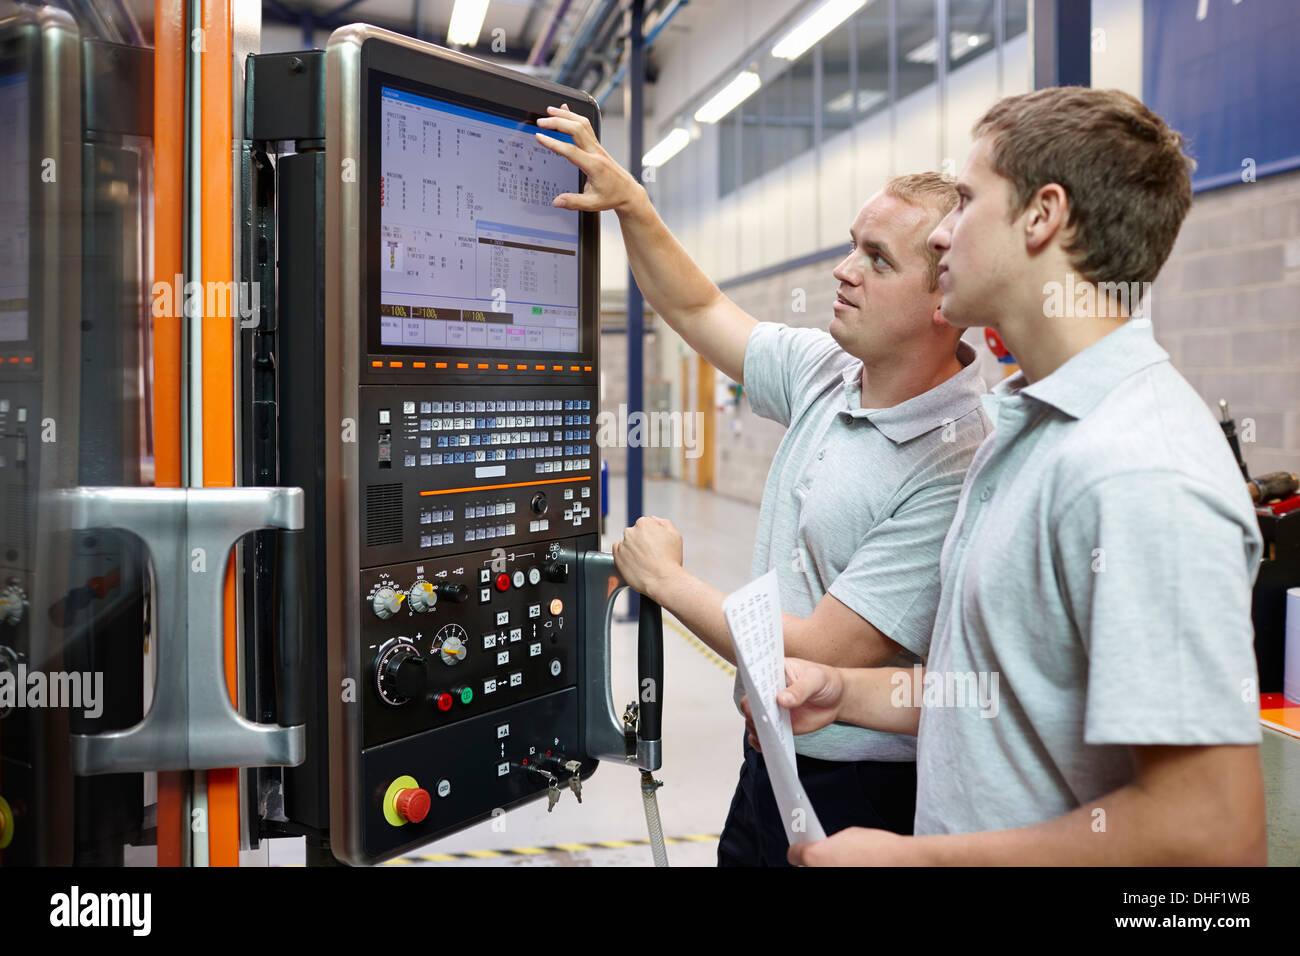 Blick auf Computer-Monitor in engineering Fabrik Arbeiter Stockbild